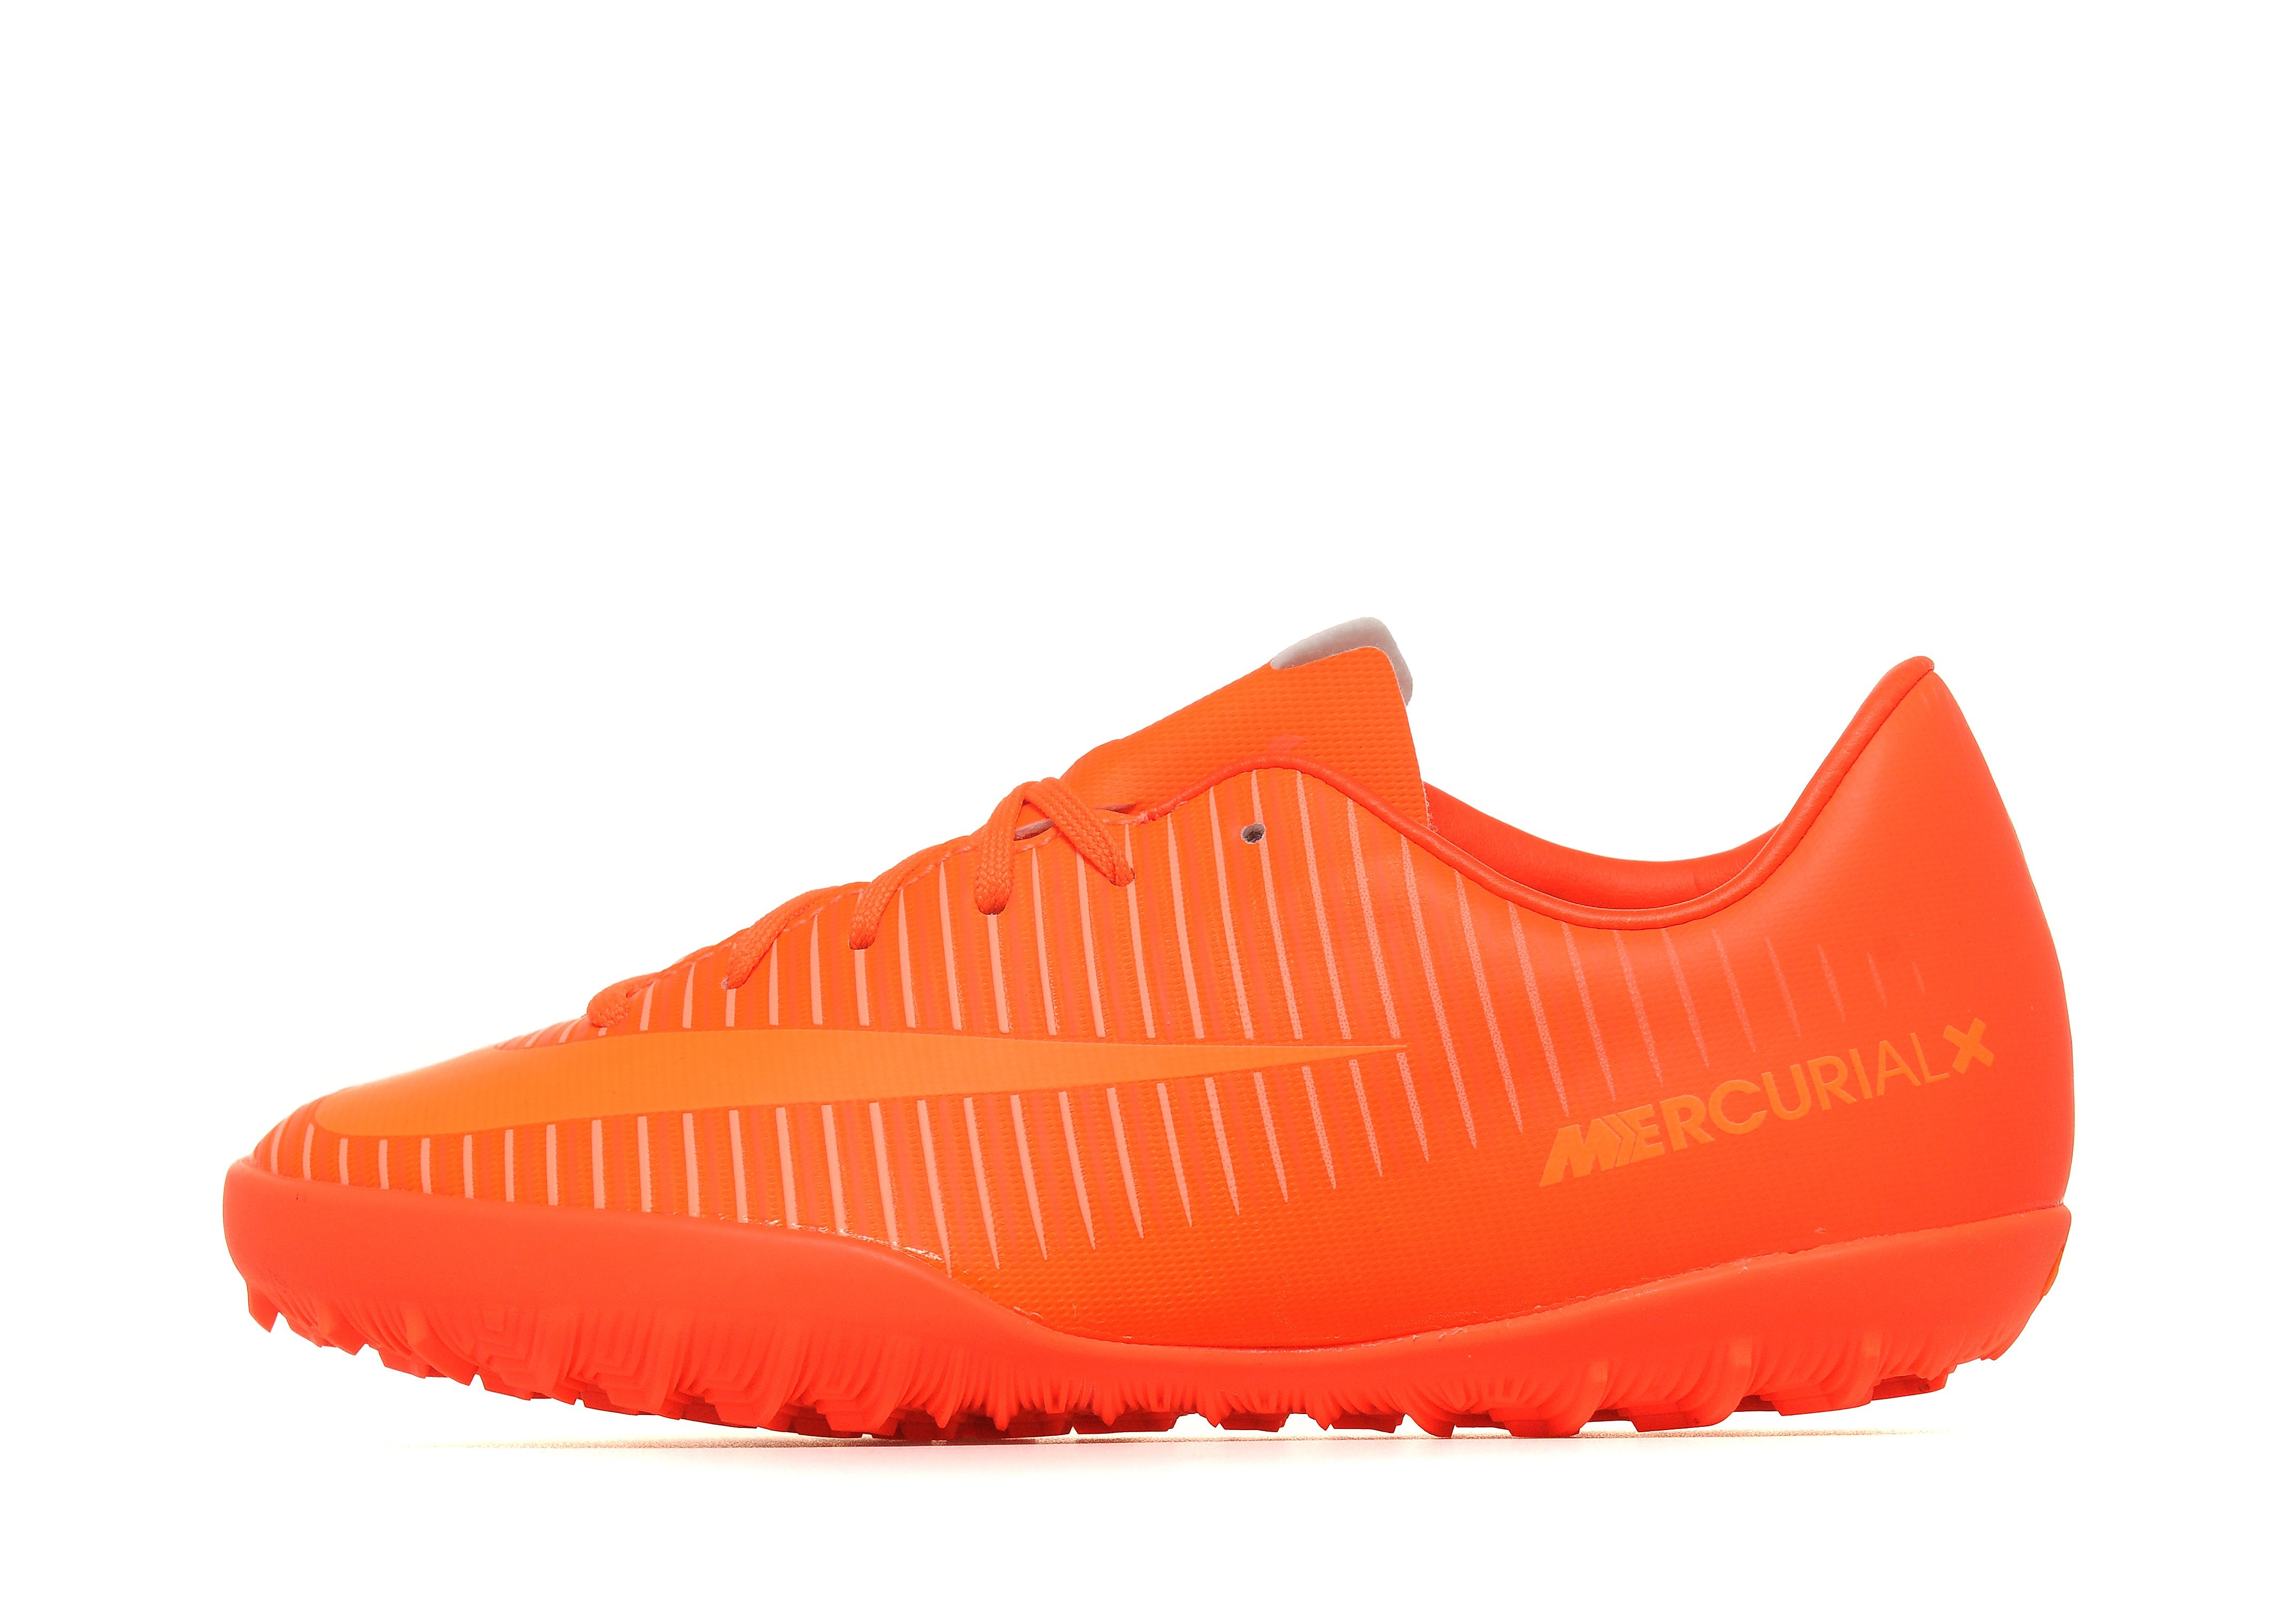 Nike Football X Glow Mercurial Victory VI Children